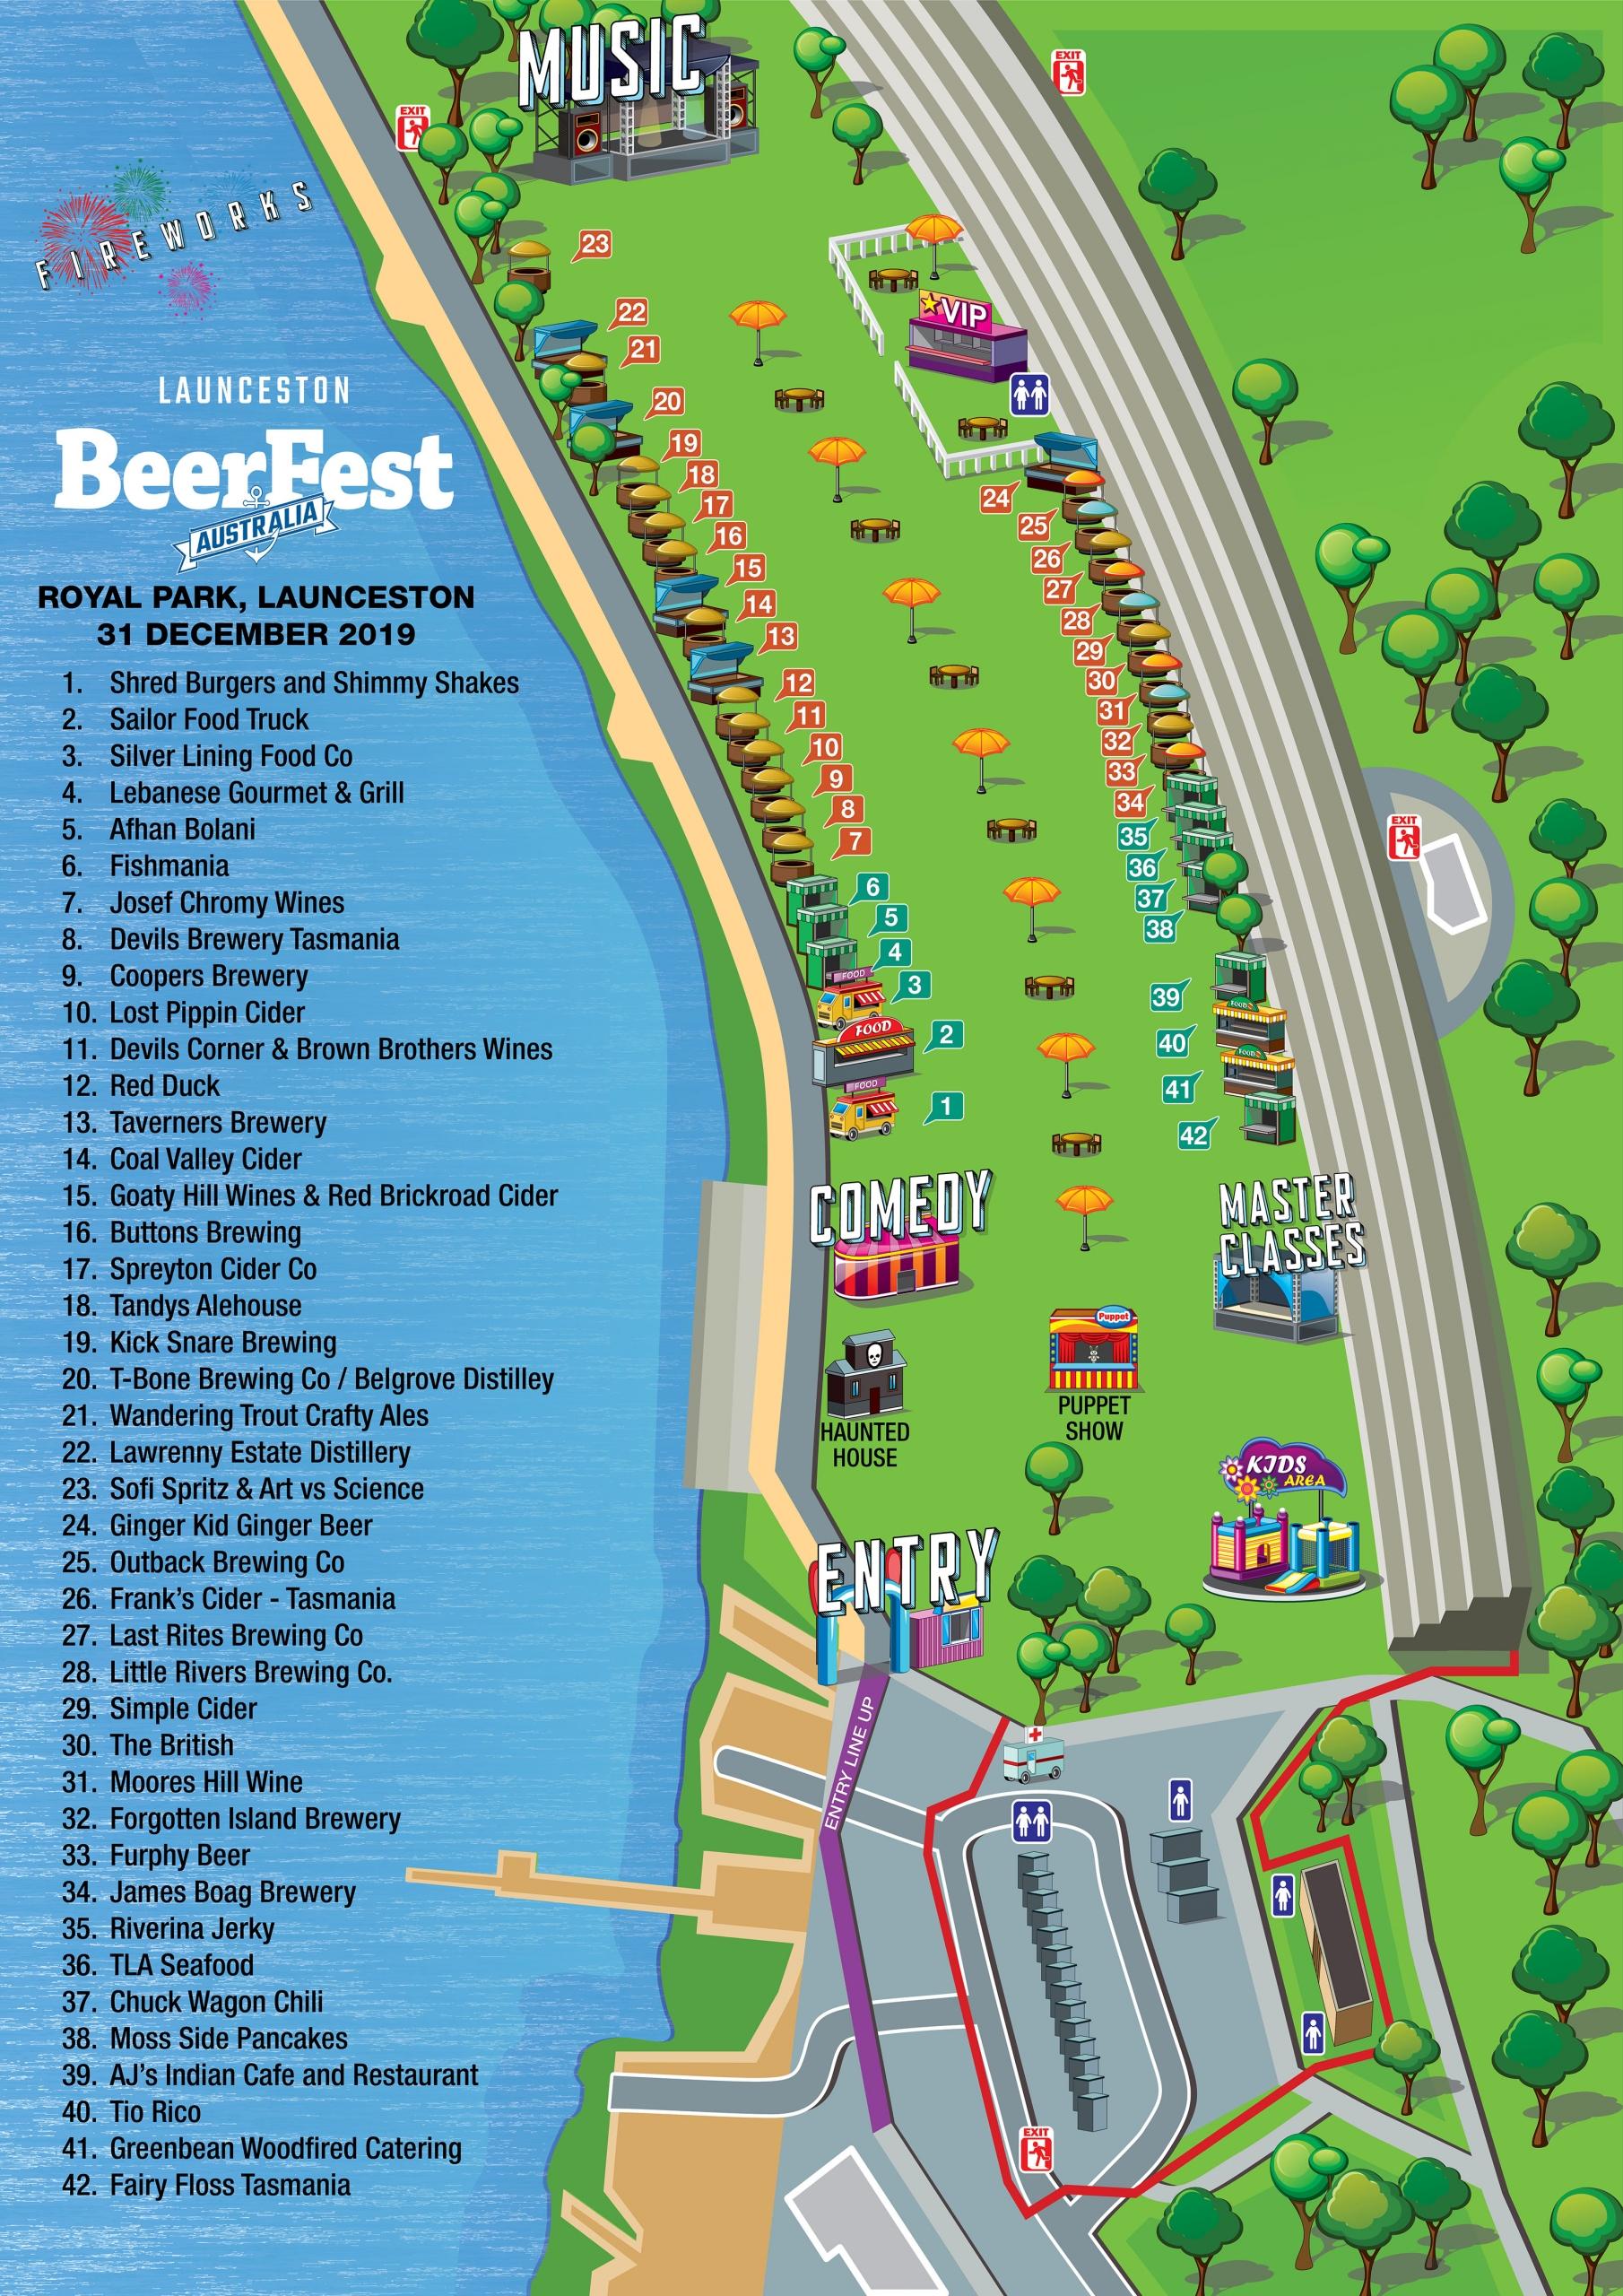 Festival Map for Launceston BeerFest